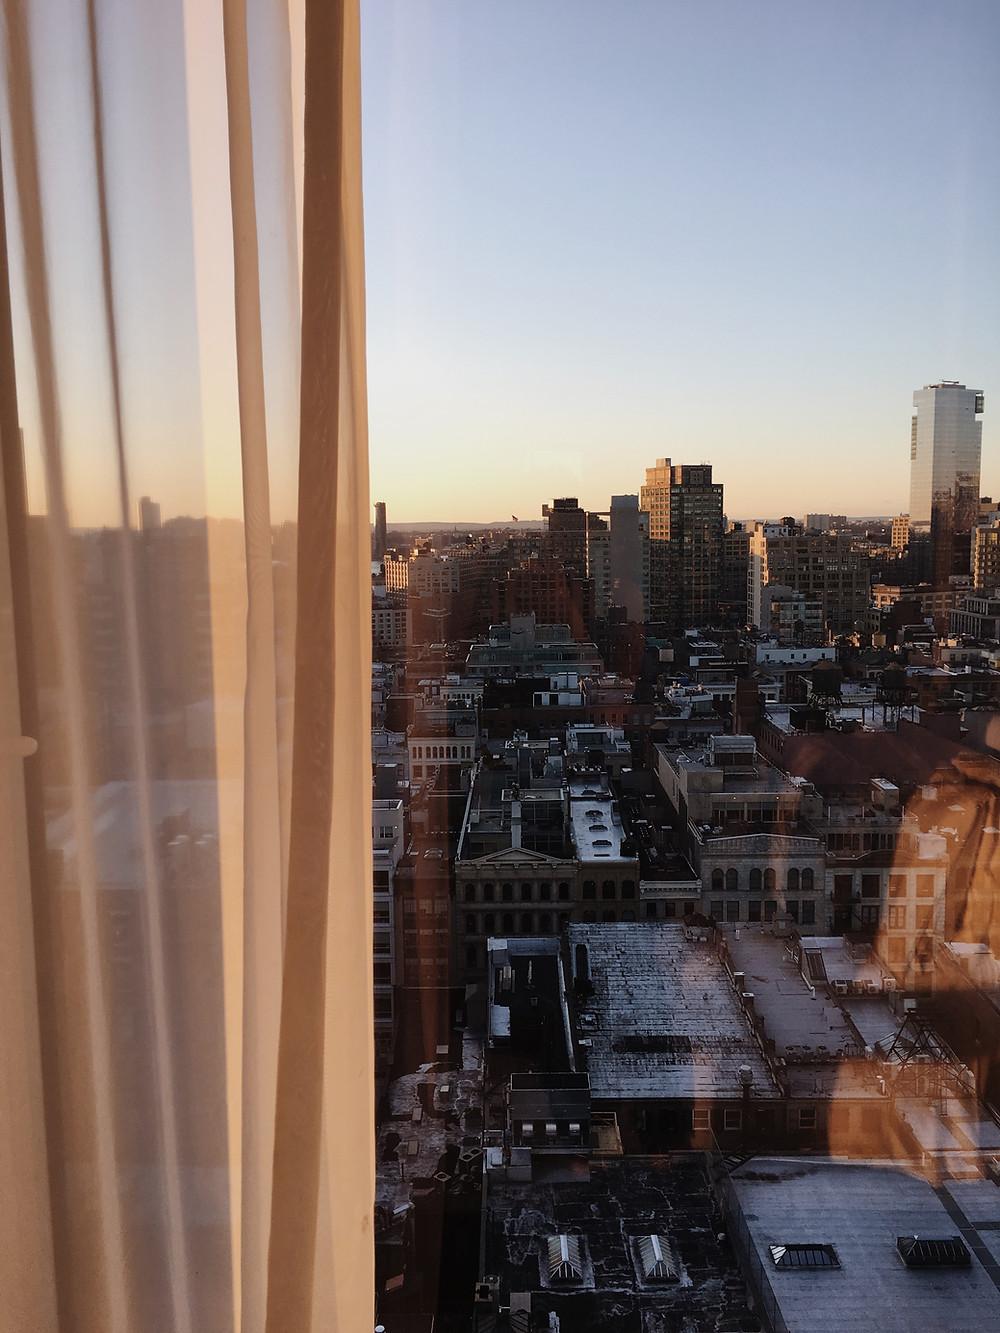 NYC makes me :)